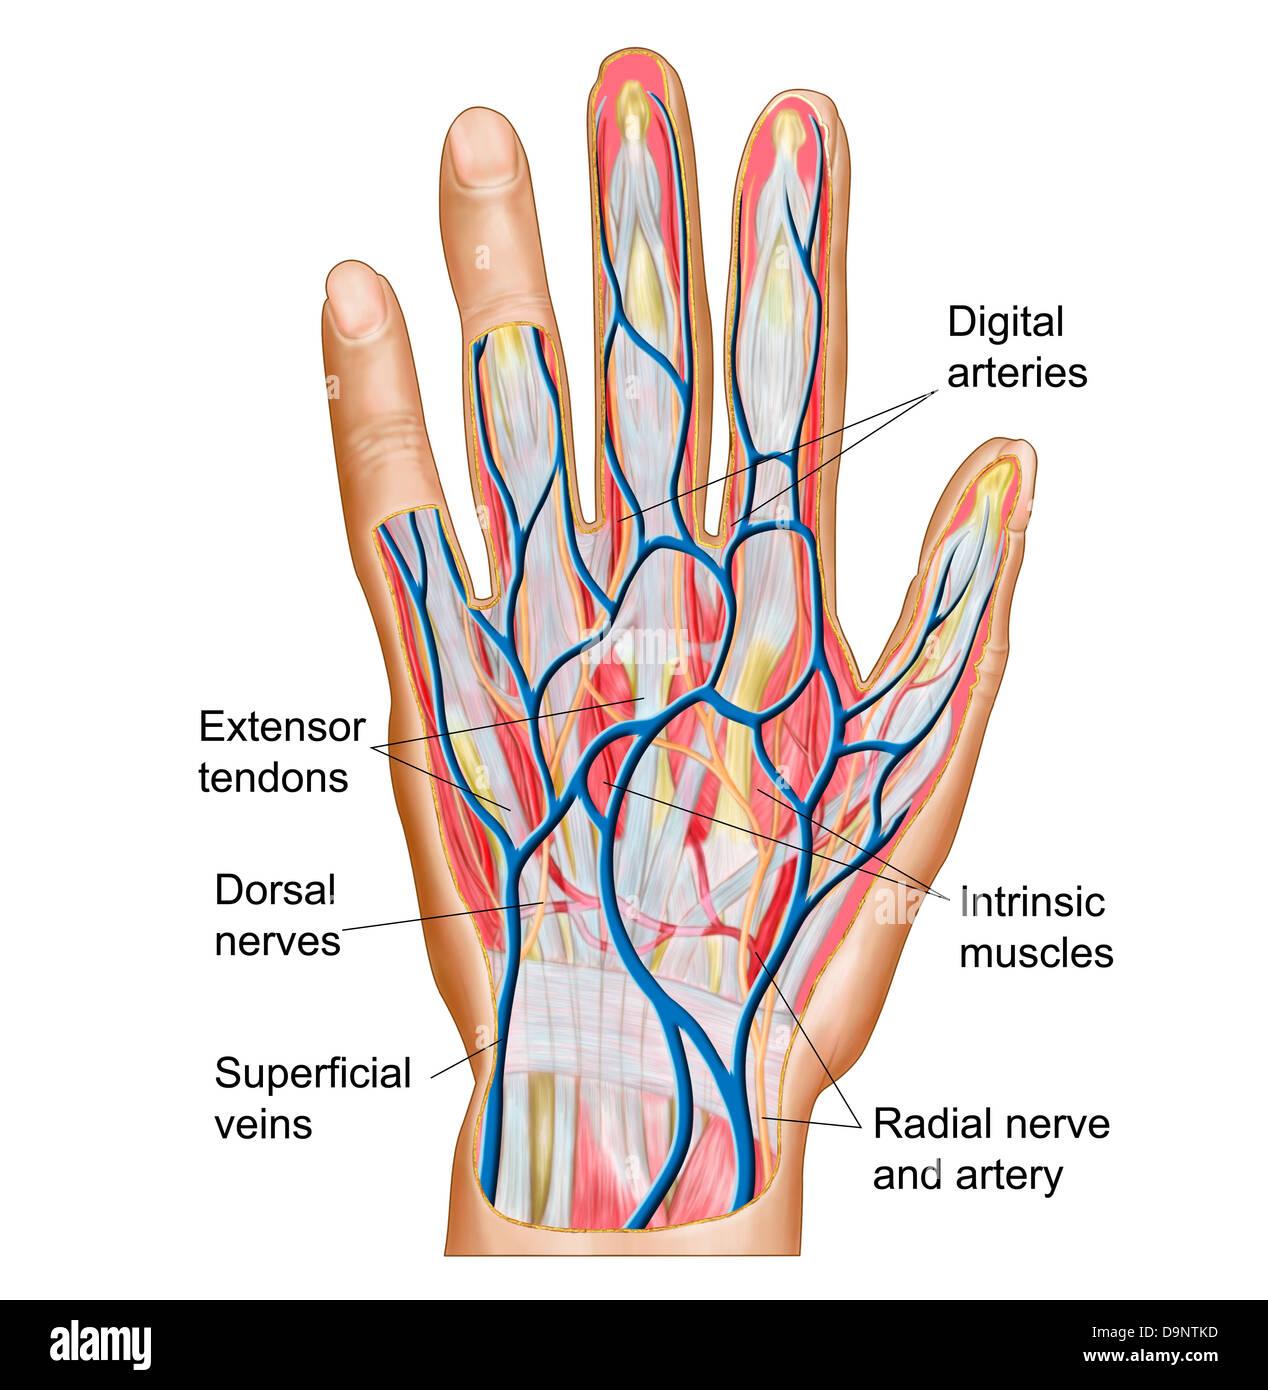 Anatomy of back of human hand Stock Photo: 57643361 - Alamy